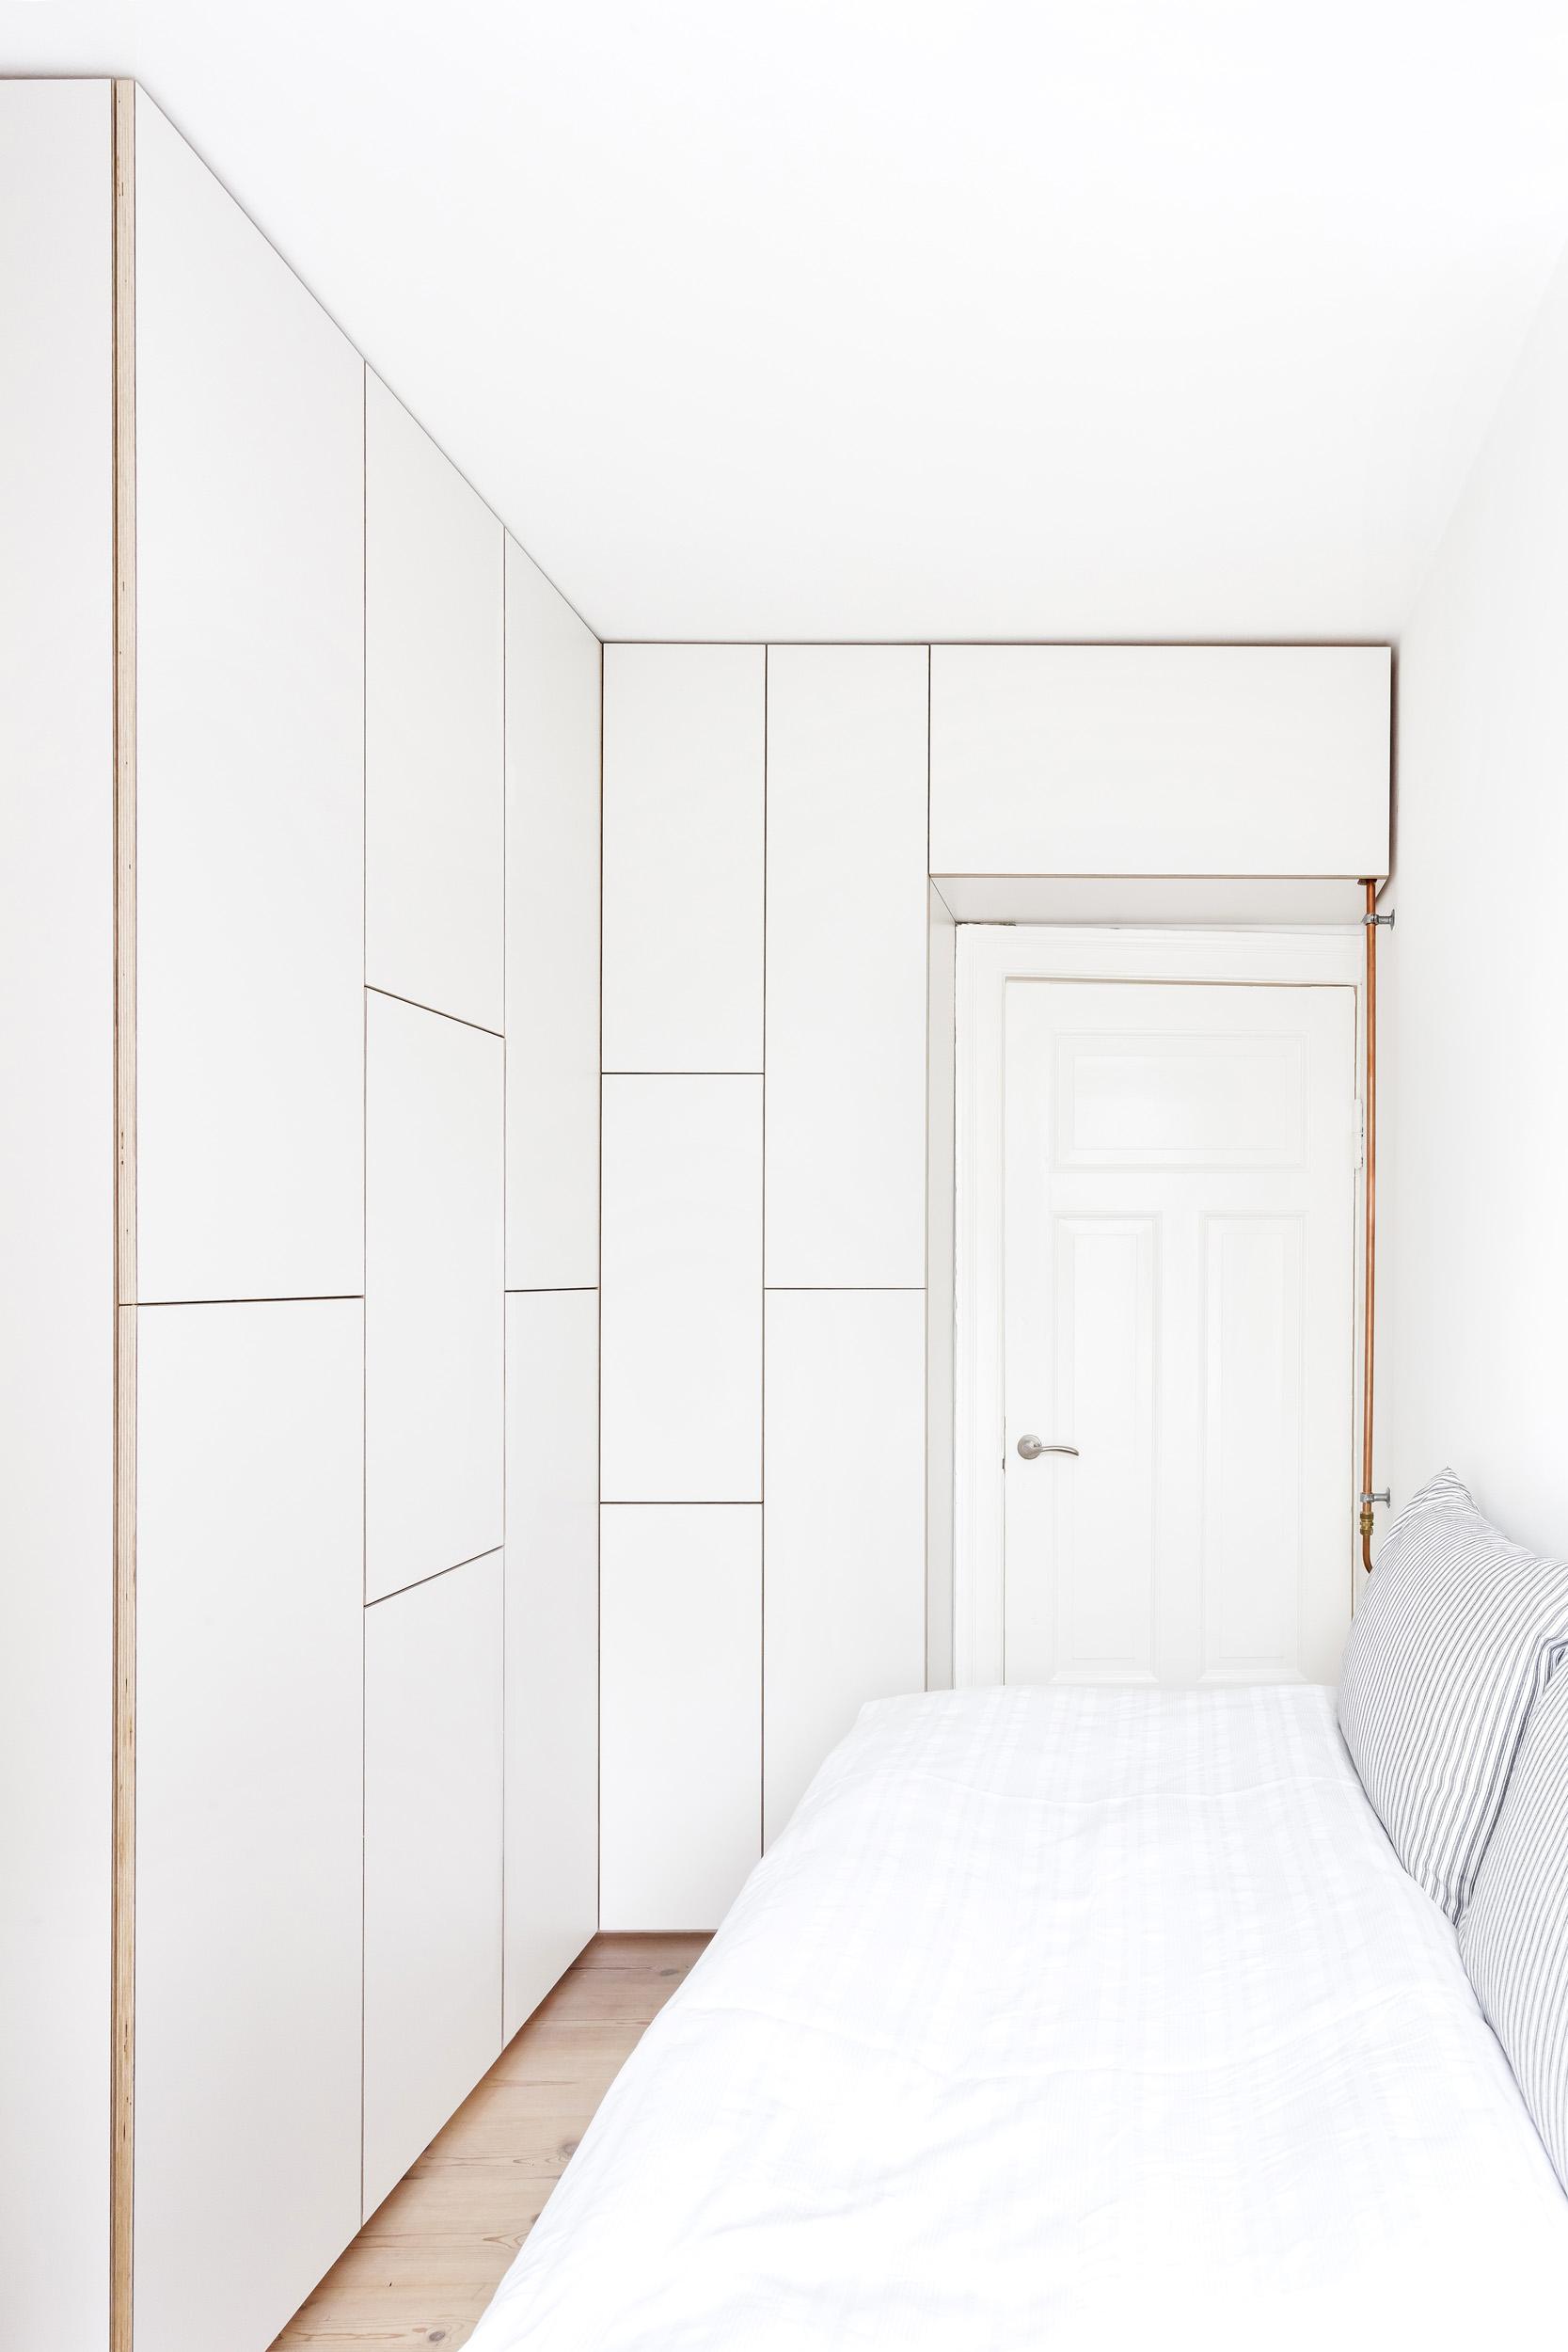 0252-m3v1-storage-closet-tiny-guest-room-white-minimal-stay-project-2500x.jpg